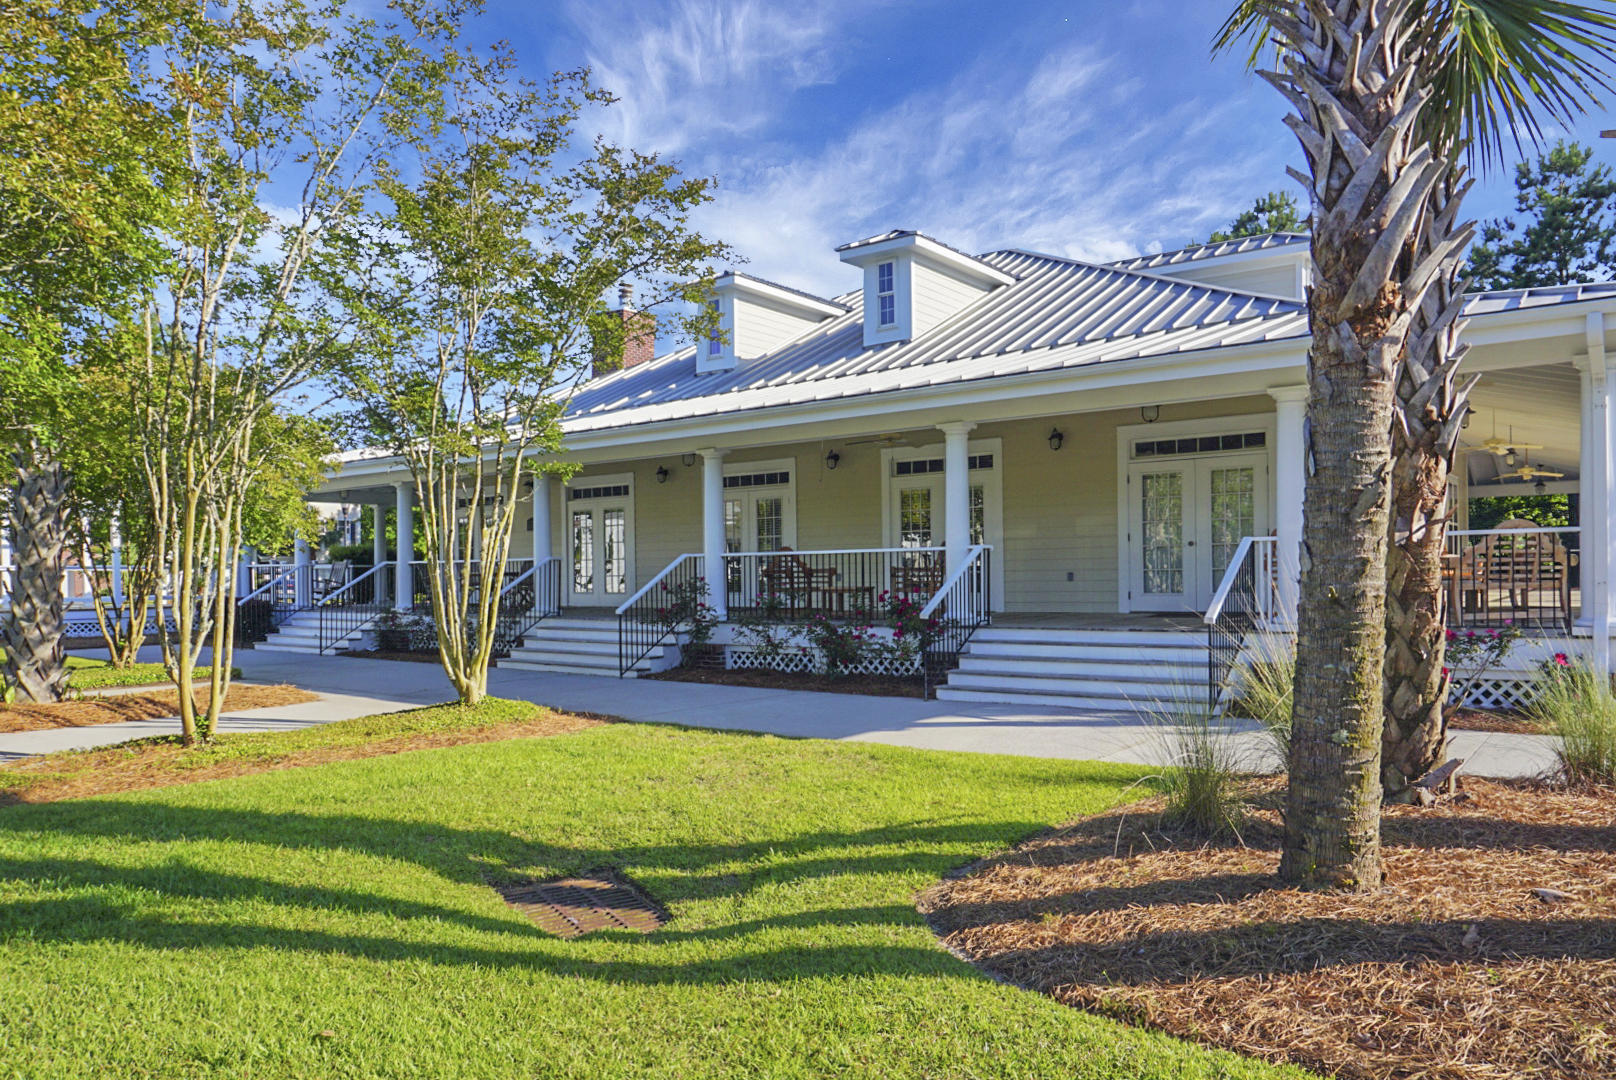 Etiwan Pointe Homes For Sale - 269 Etiwan Pointe, Mount Pleasant, SC - 22